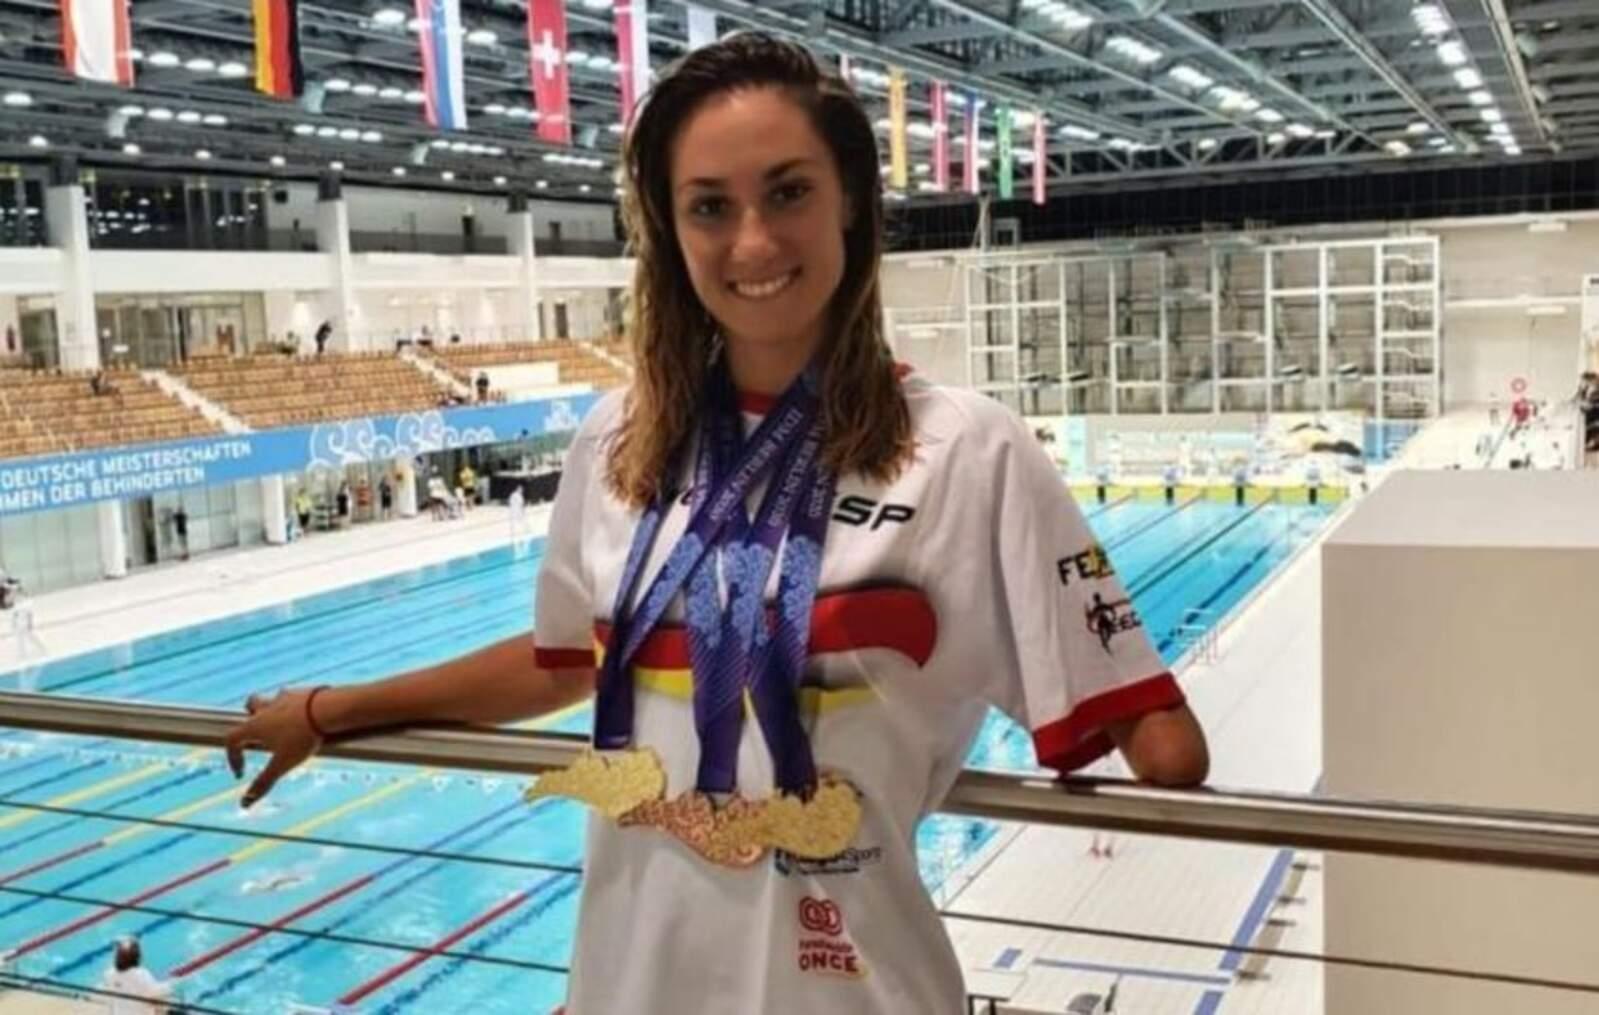 Sarai Gascón amb les tres medalles aconseguides a Berlín